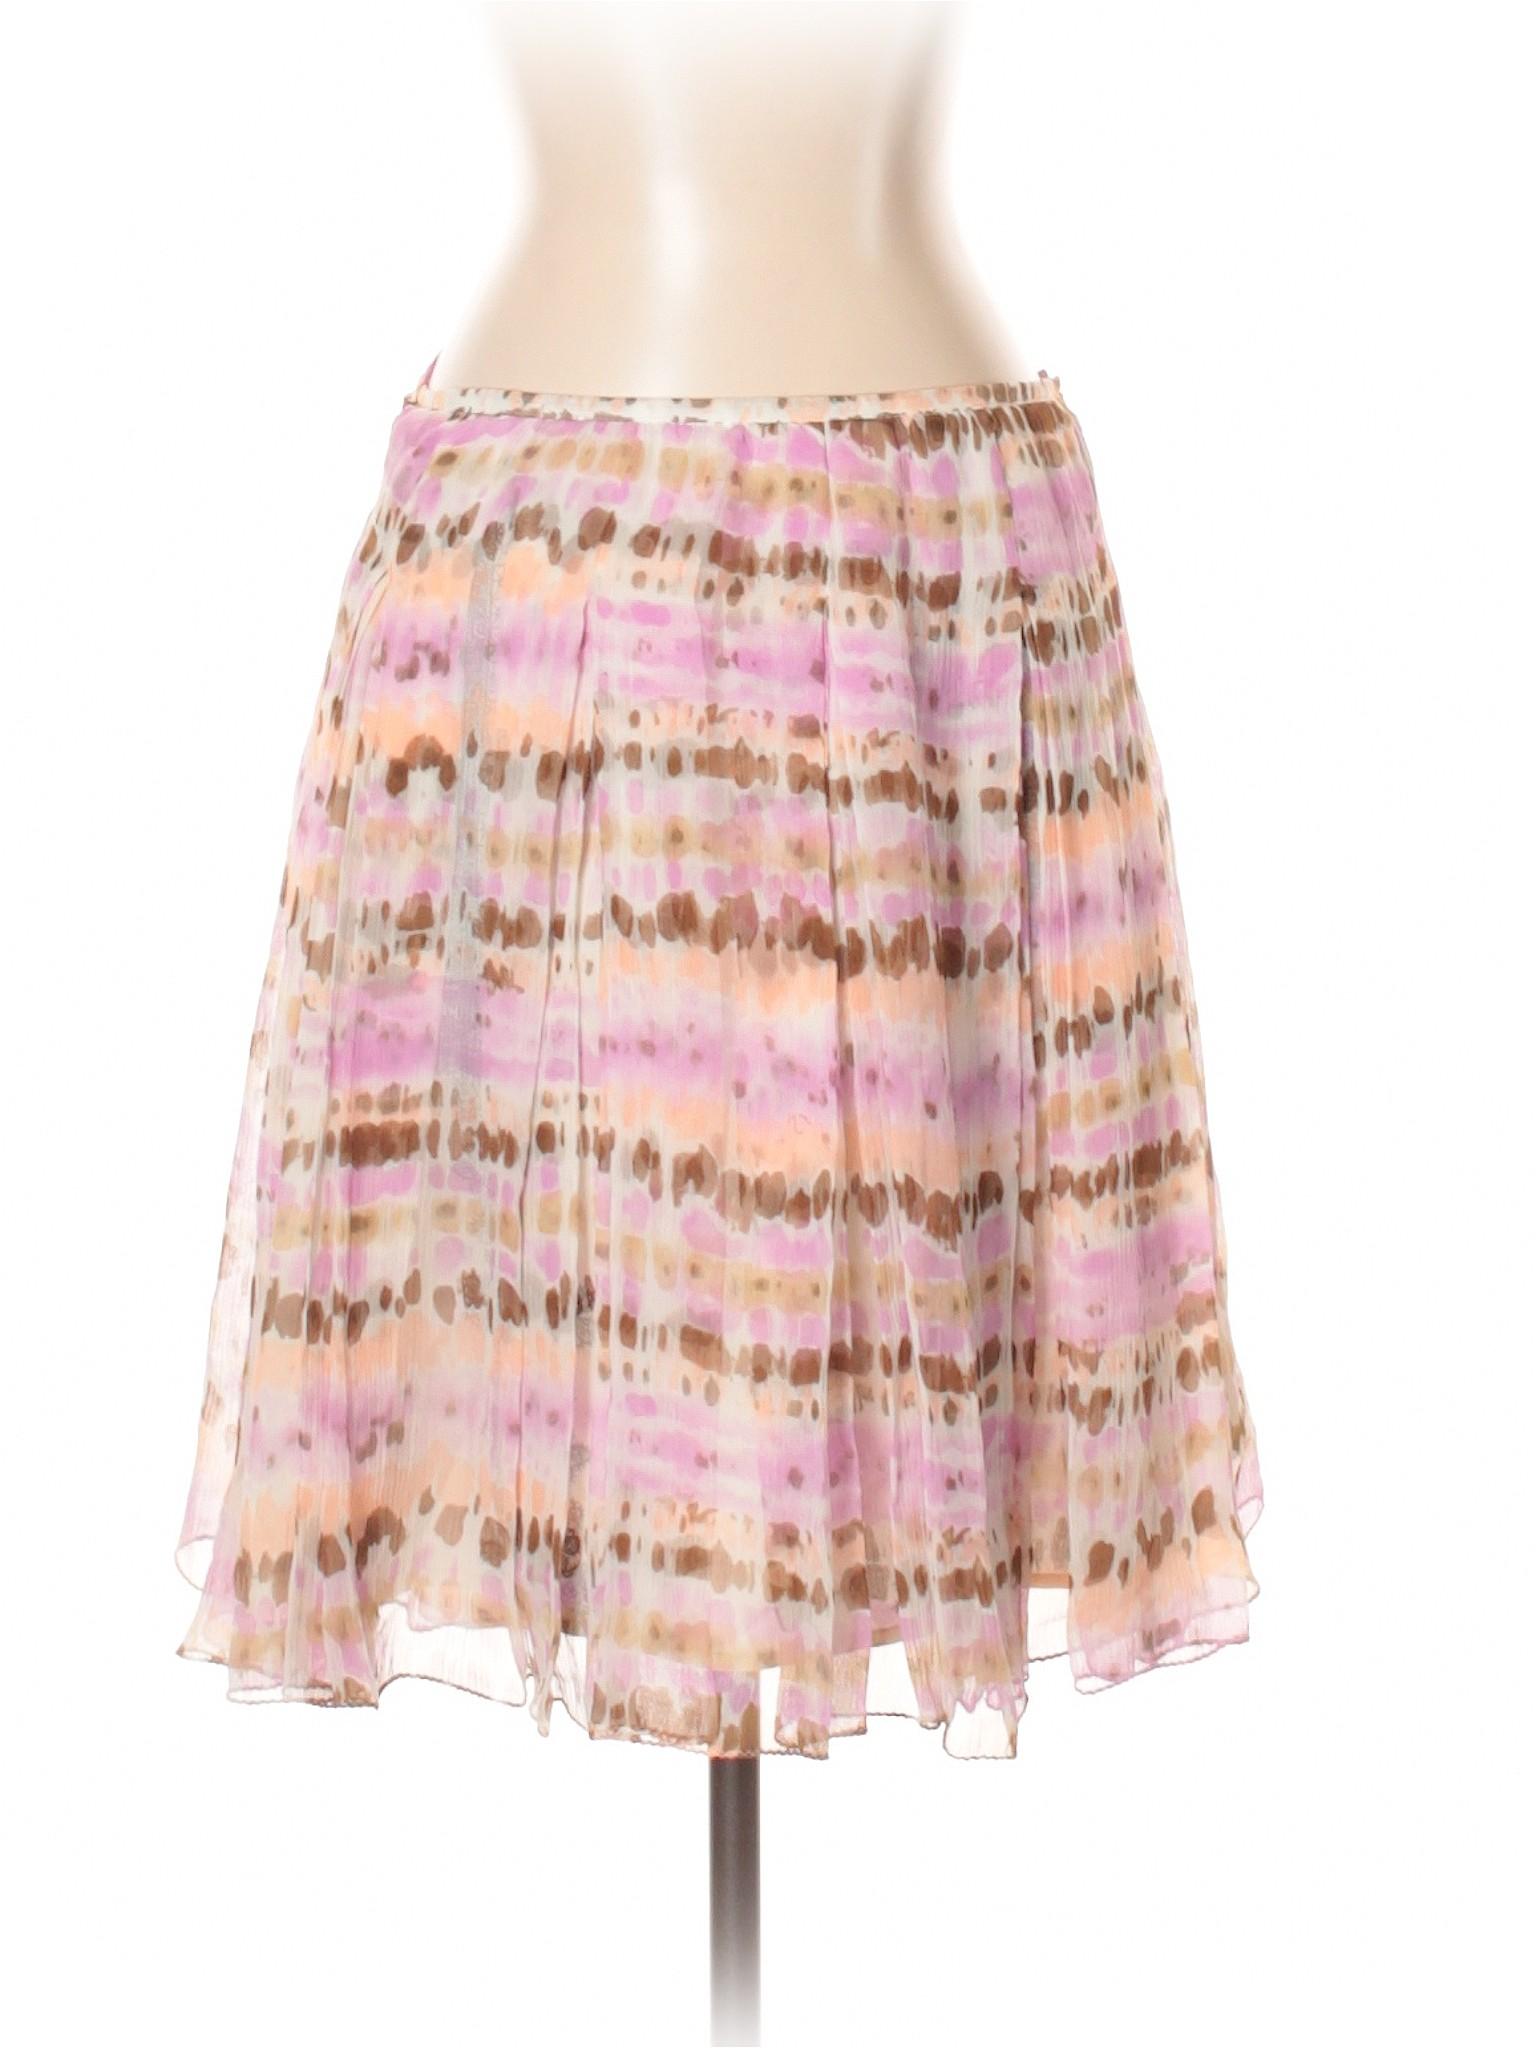 Skirt Boutique Silk Boutique Silk Skirt Boutique xgwT04qX